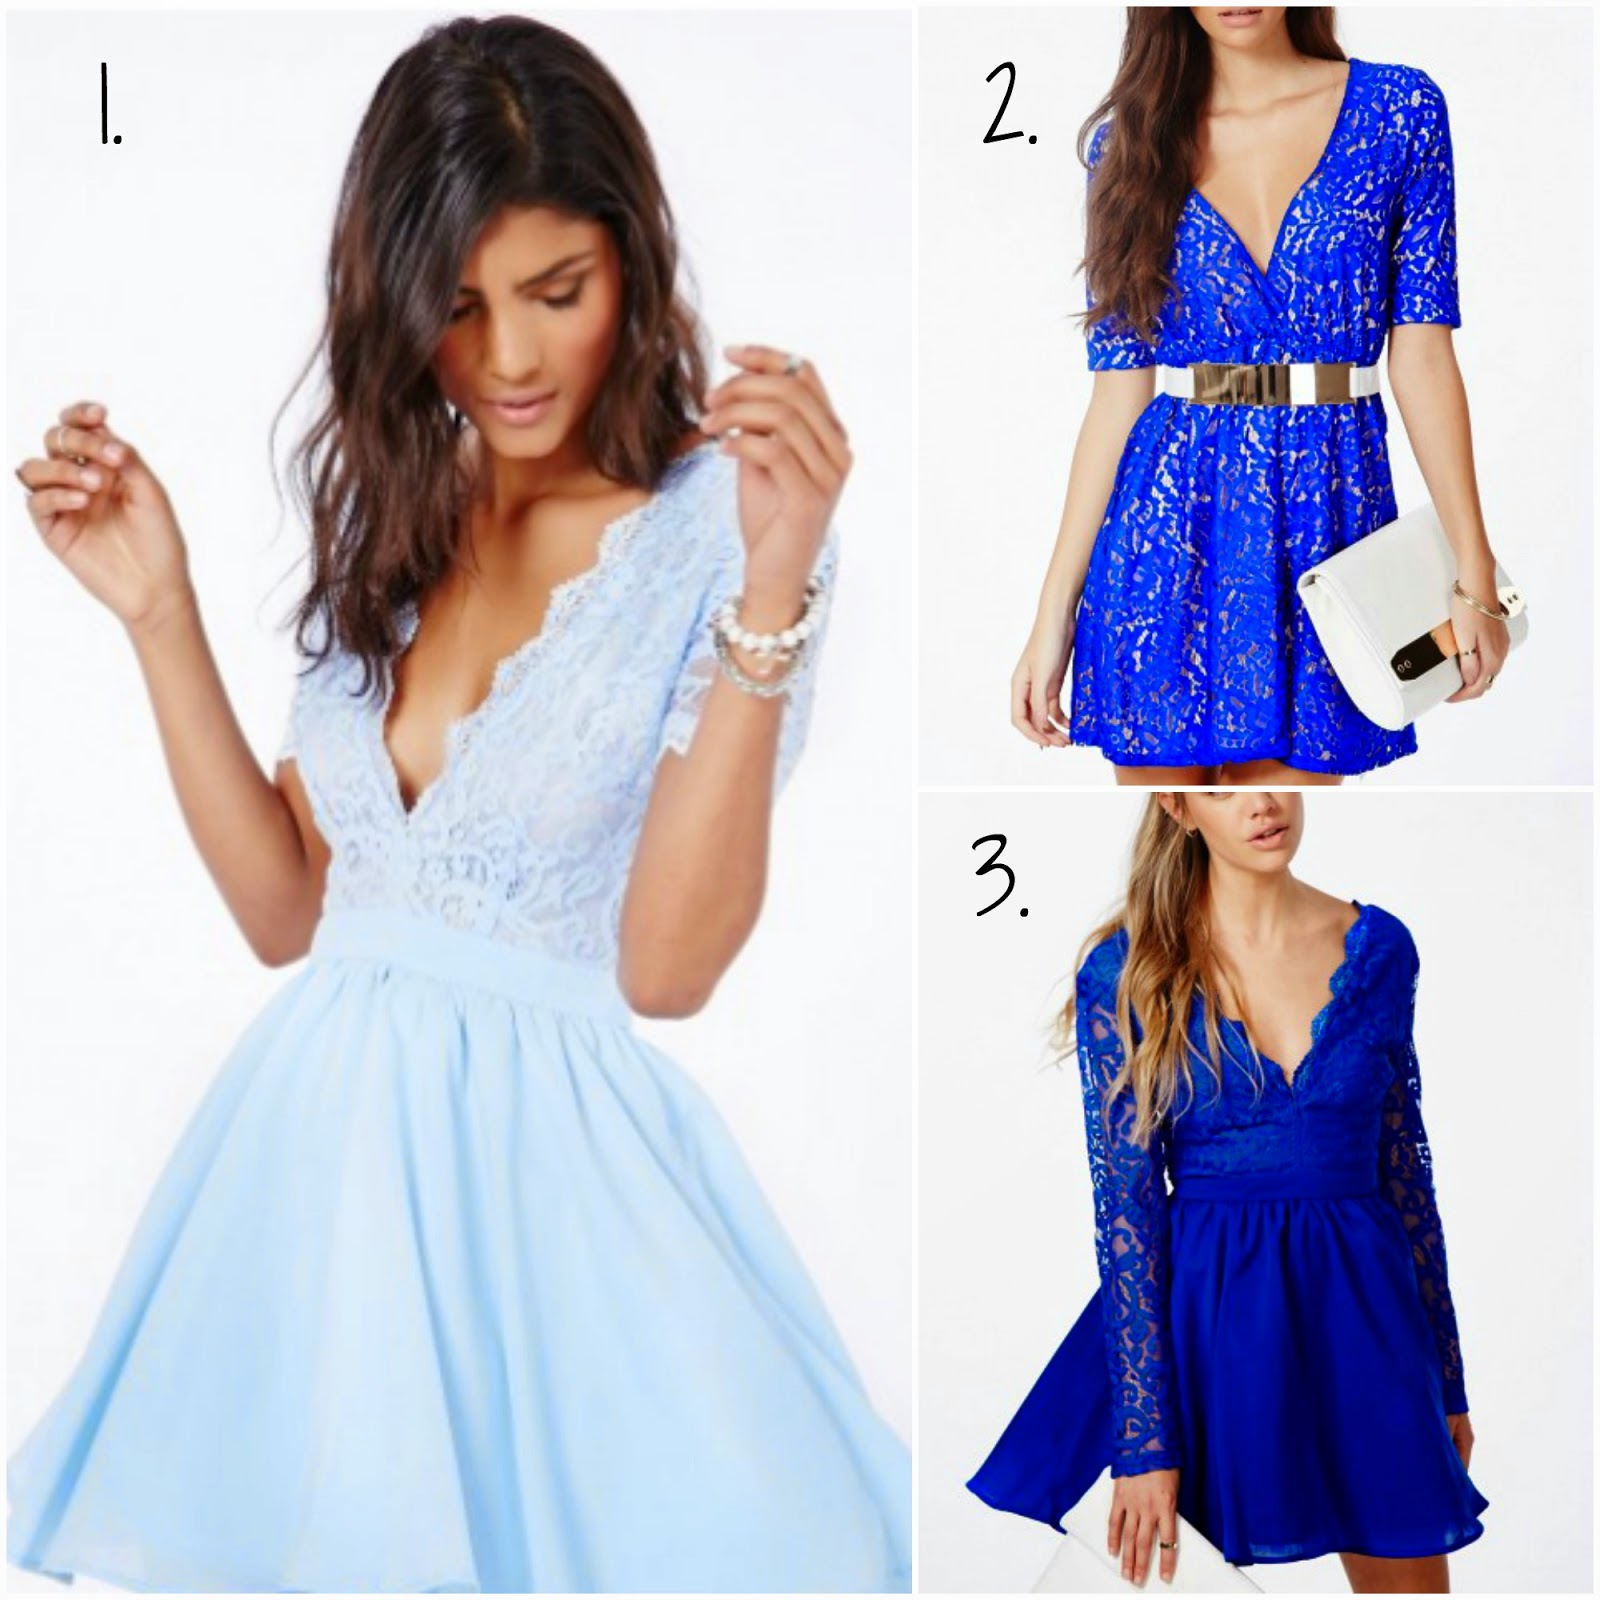 Alice in Wonderland Baby blue flower dress & pink bag The Fashion